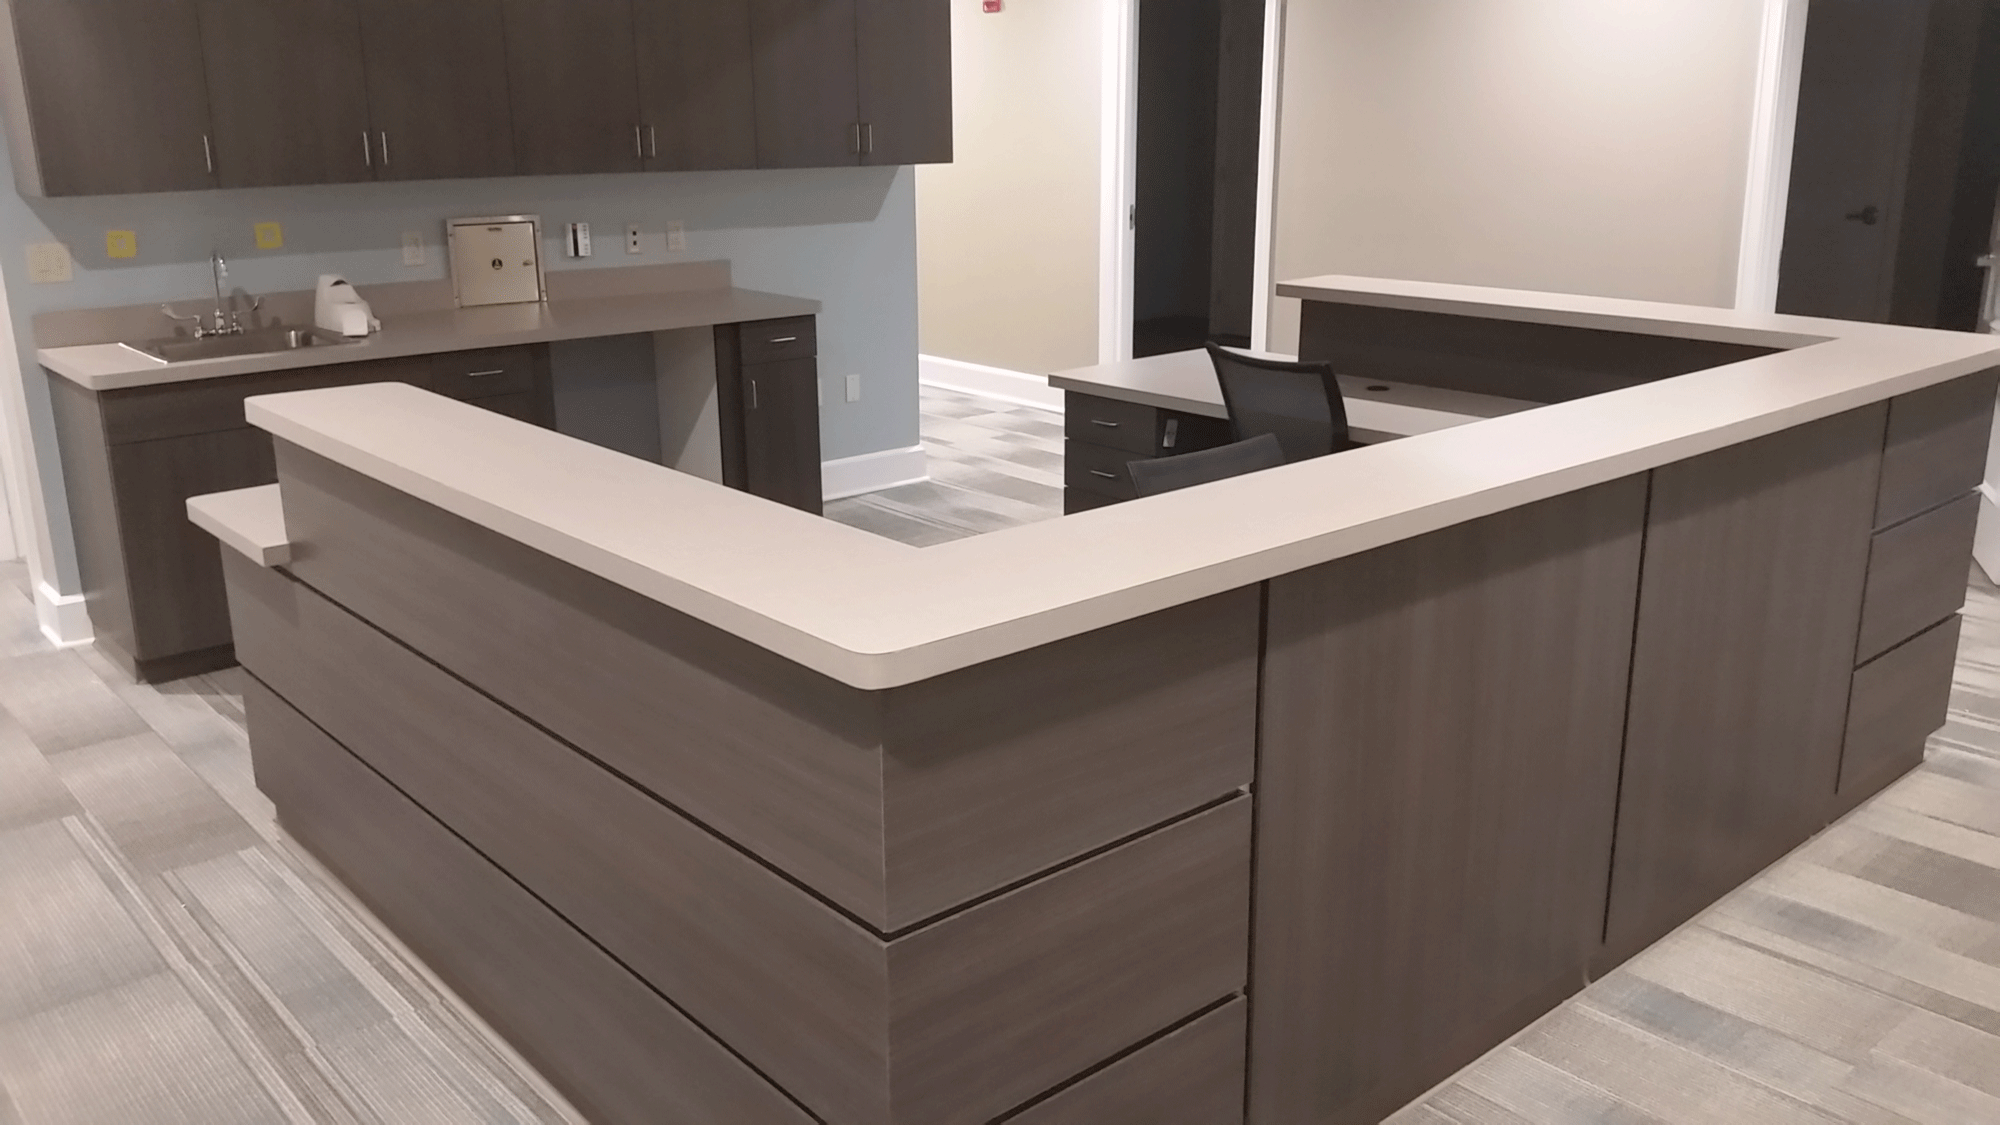 Commercial Countertop Company Northwest AR | New Century Countertops ...